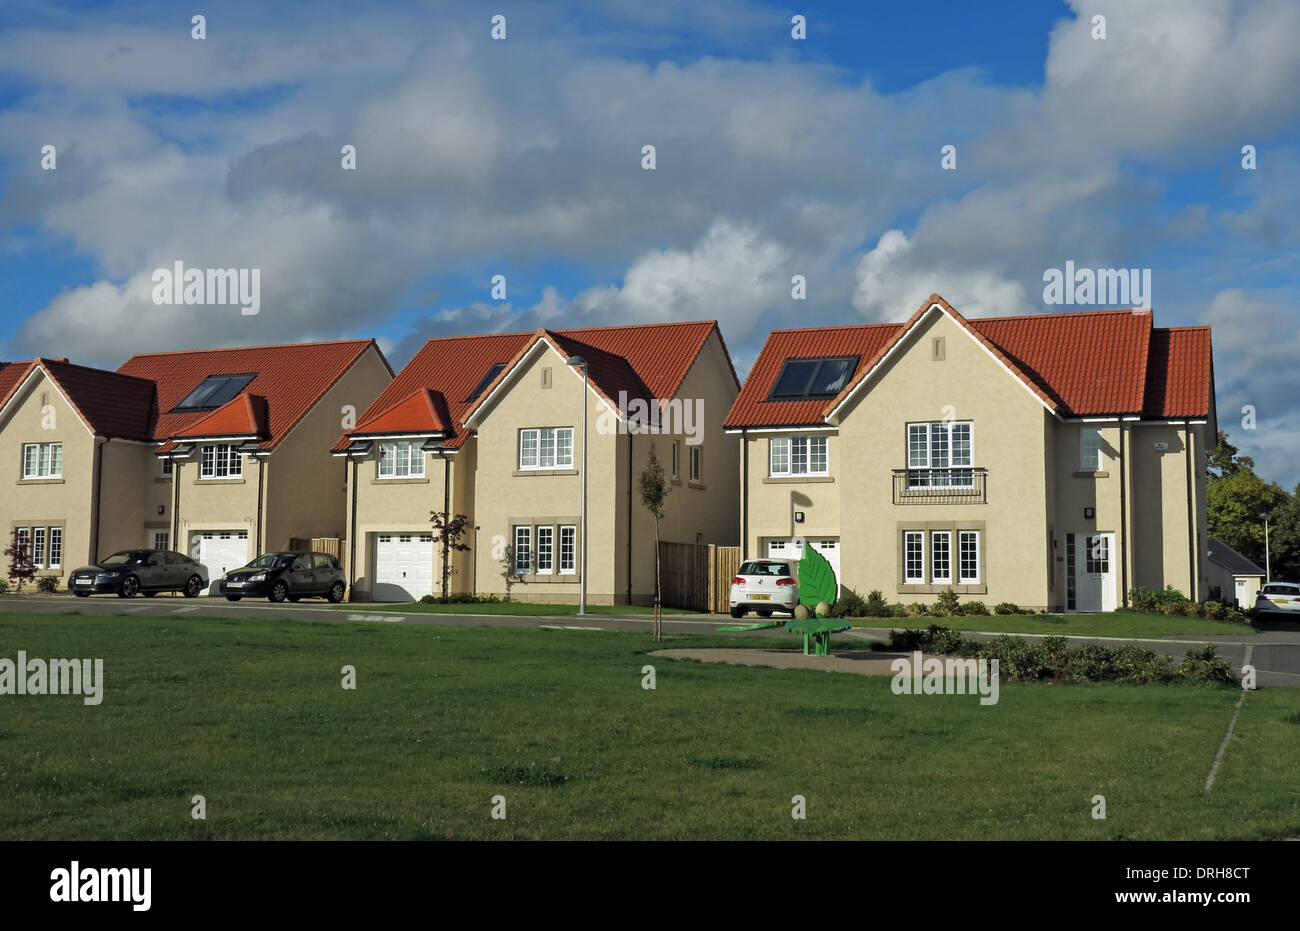 Dalkeith,Edinburgh,Midlothian,Scotland,UK,red,tile,roof,solar,panel,panels,eco,ecofriendly,modern,building,homes,detached,GoTonySmith,Buy Pictures of,Buy Images Of